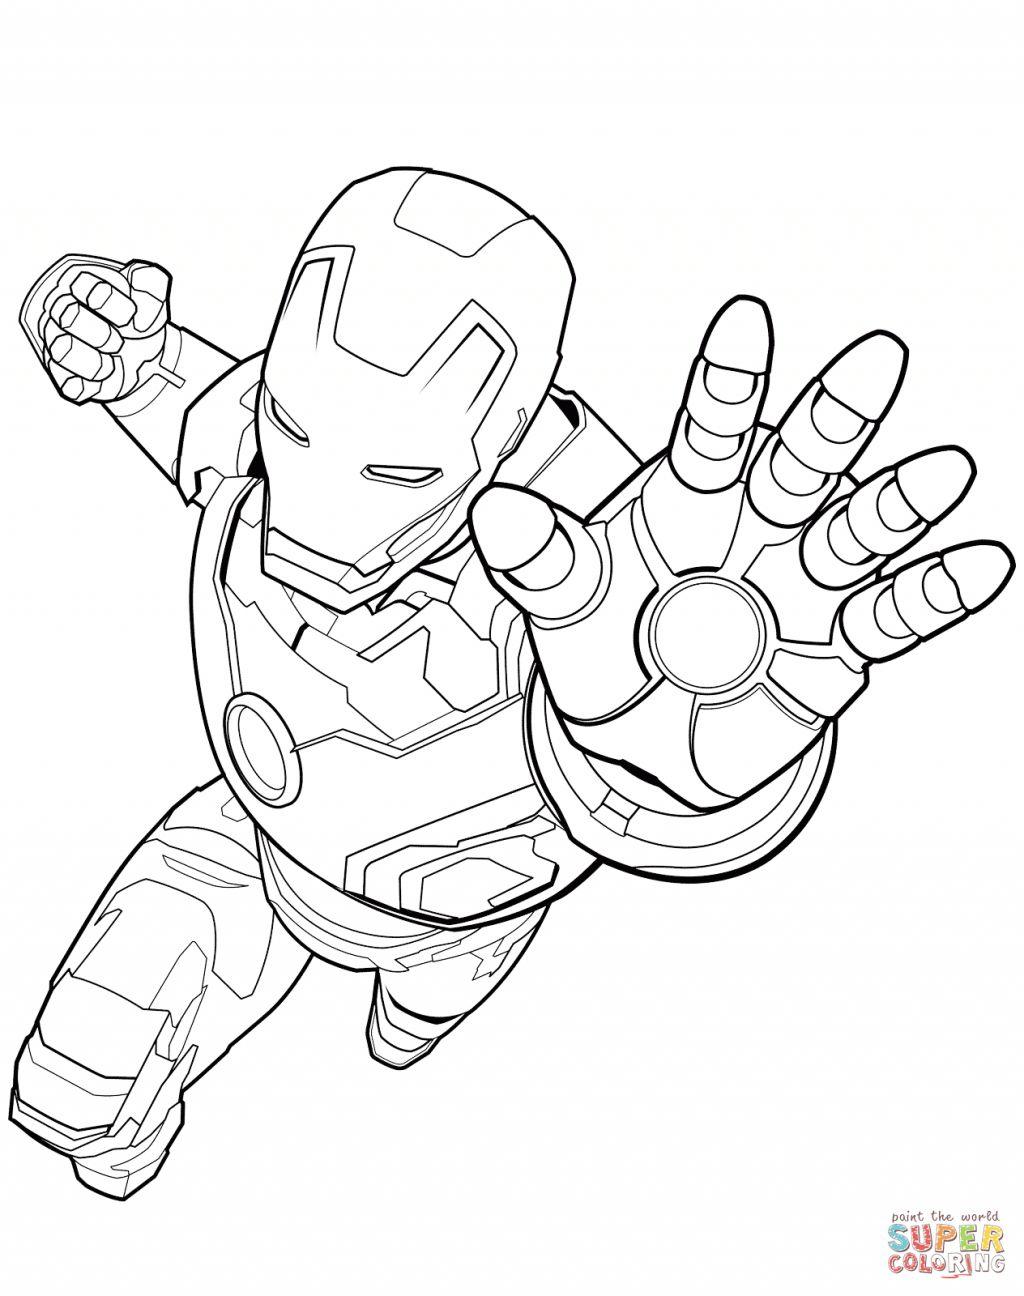 27+ Brilliant Picture of Superhero Coloring Page